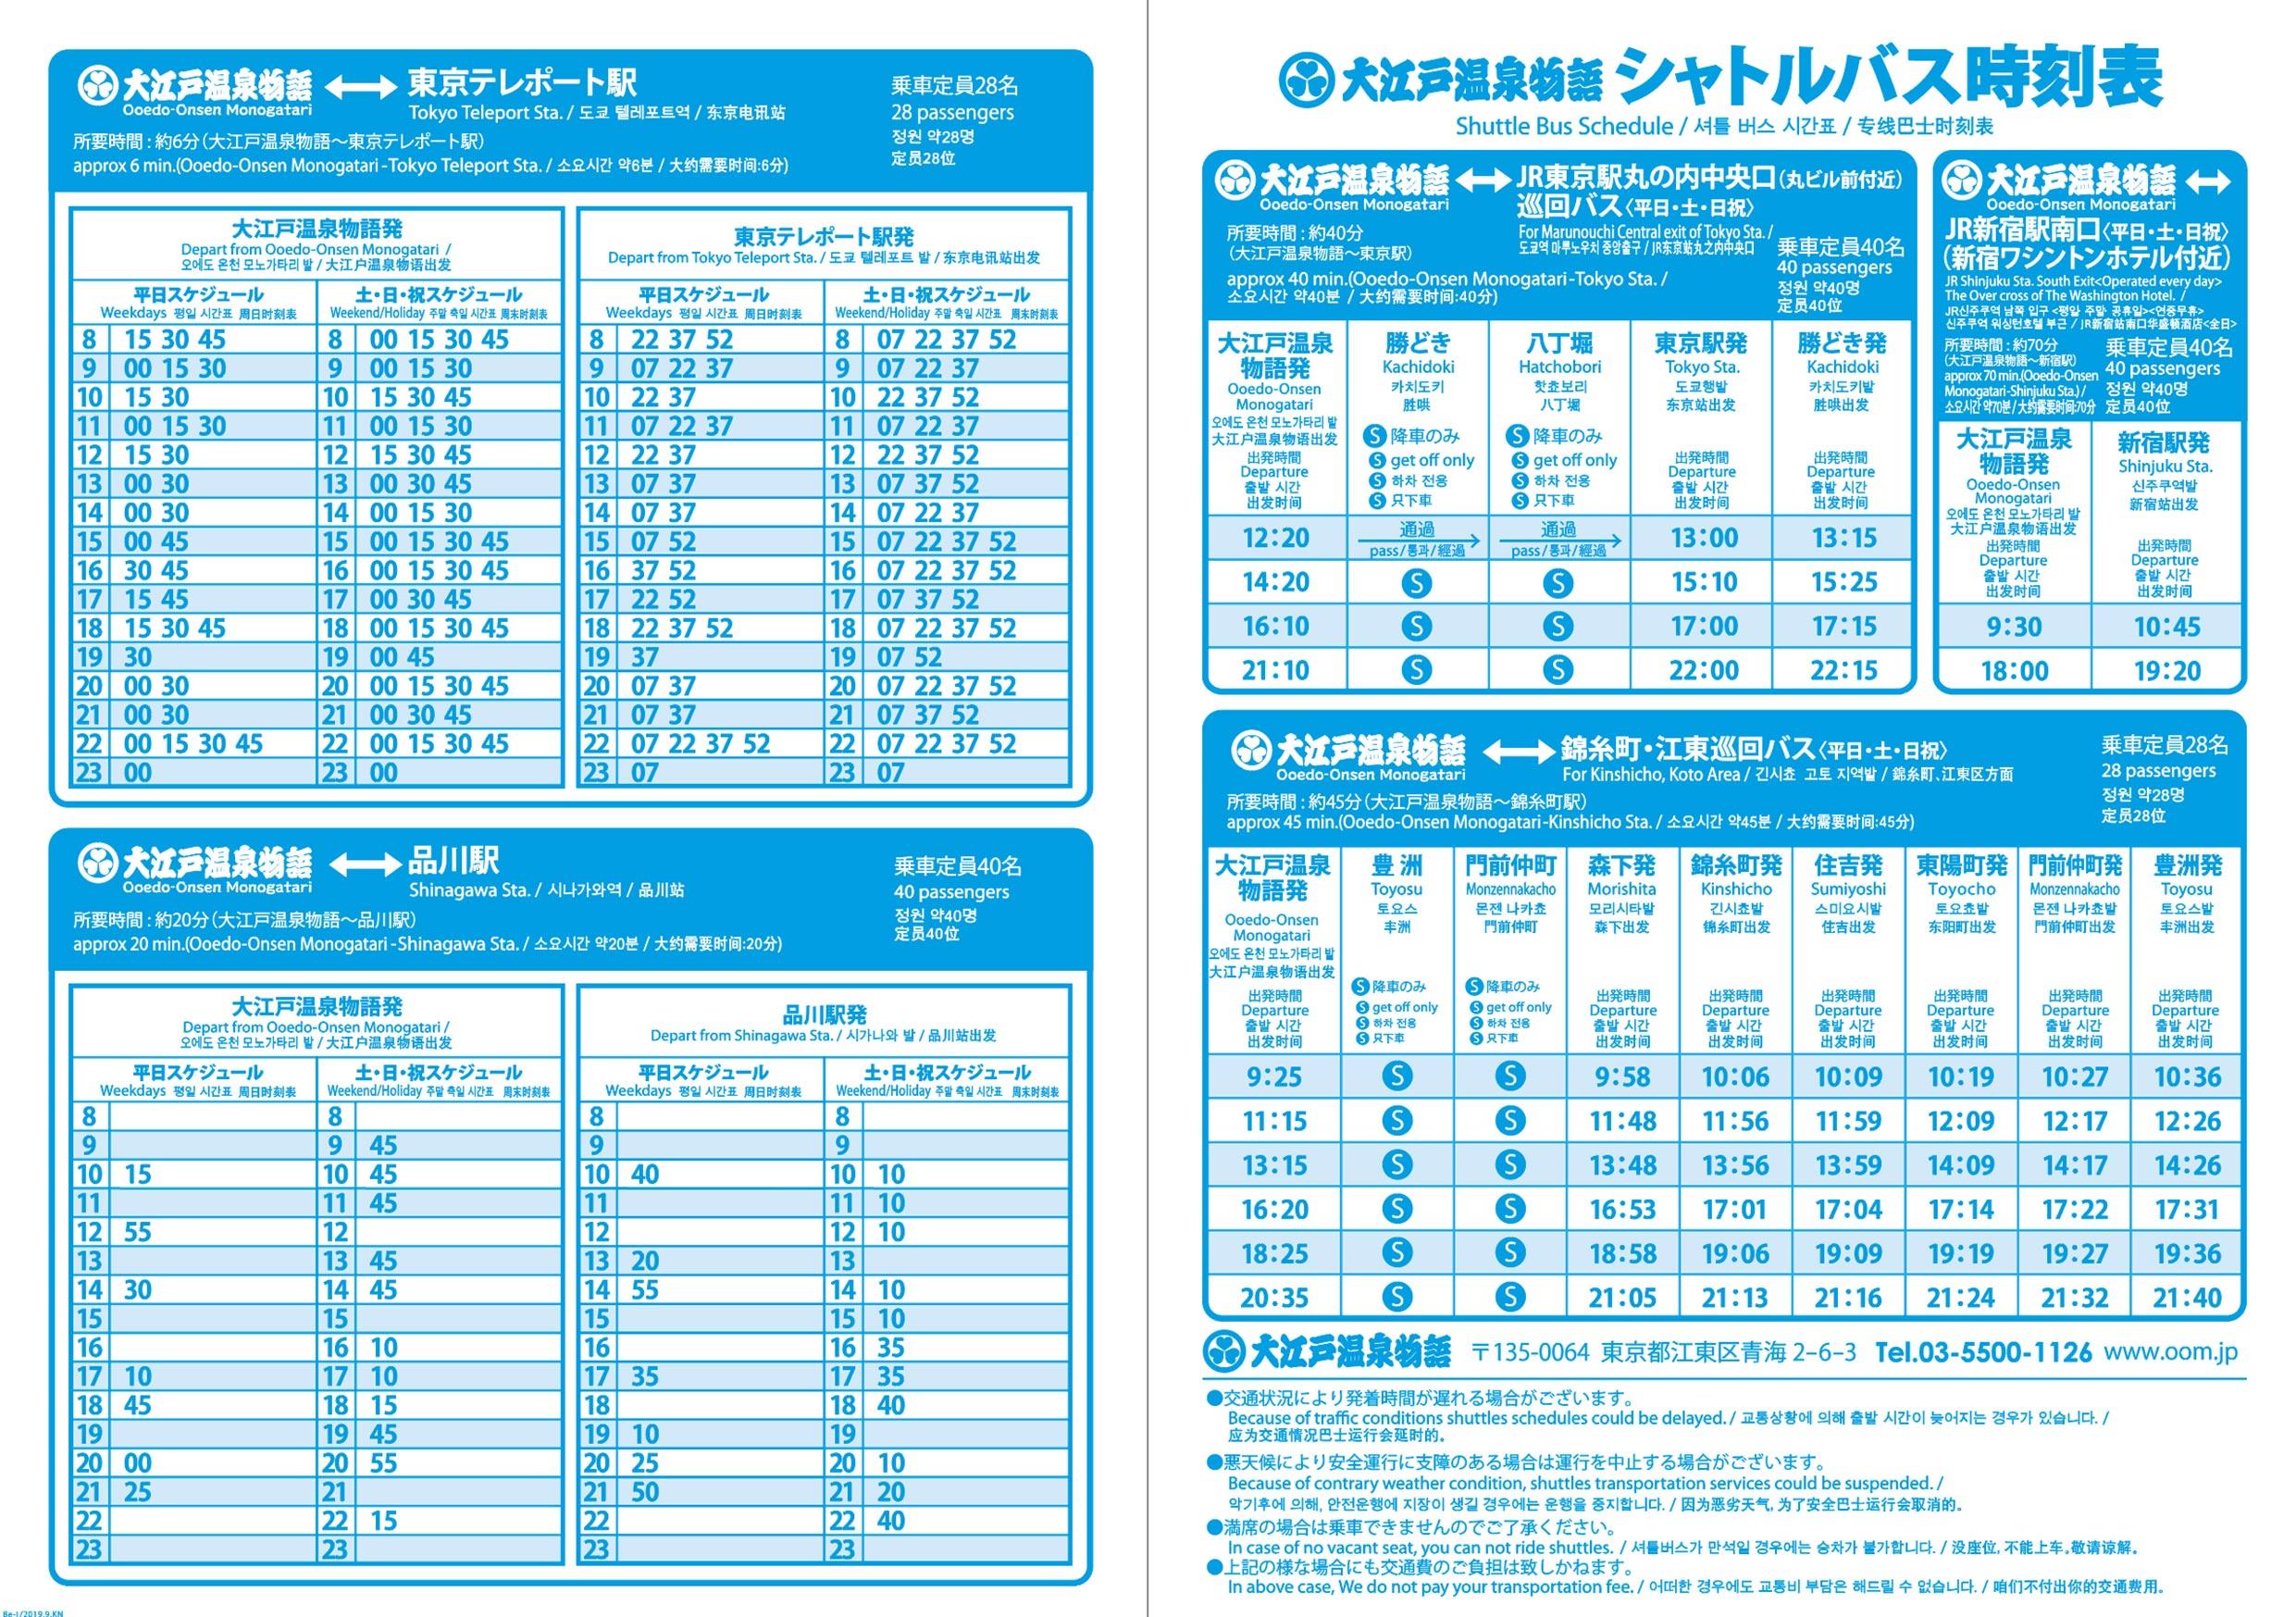 http://daiba.ooedoonsen.jp/access/img/img_bus-modal-5-2.jpg